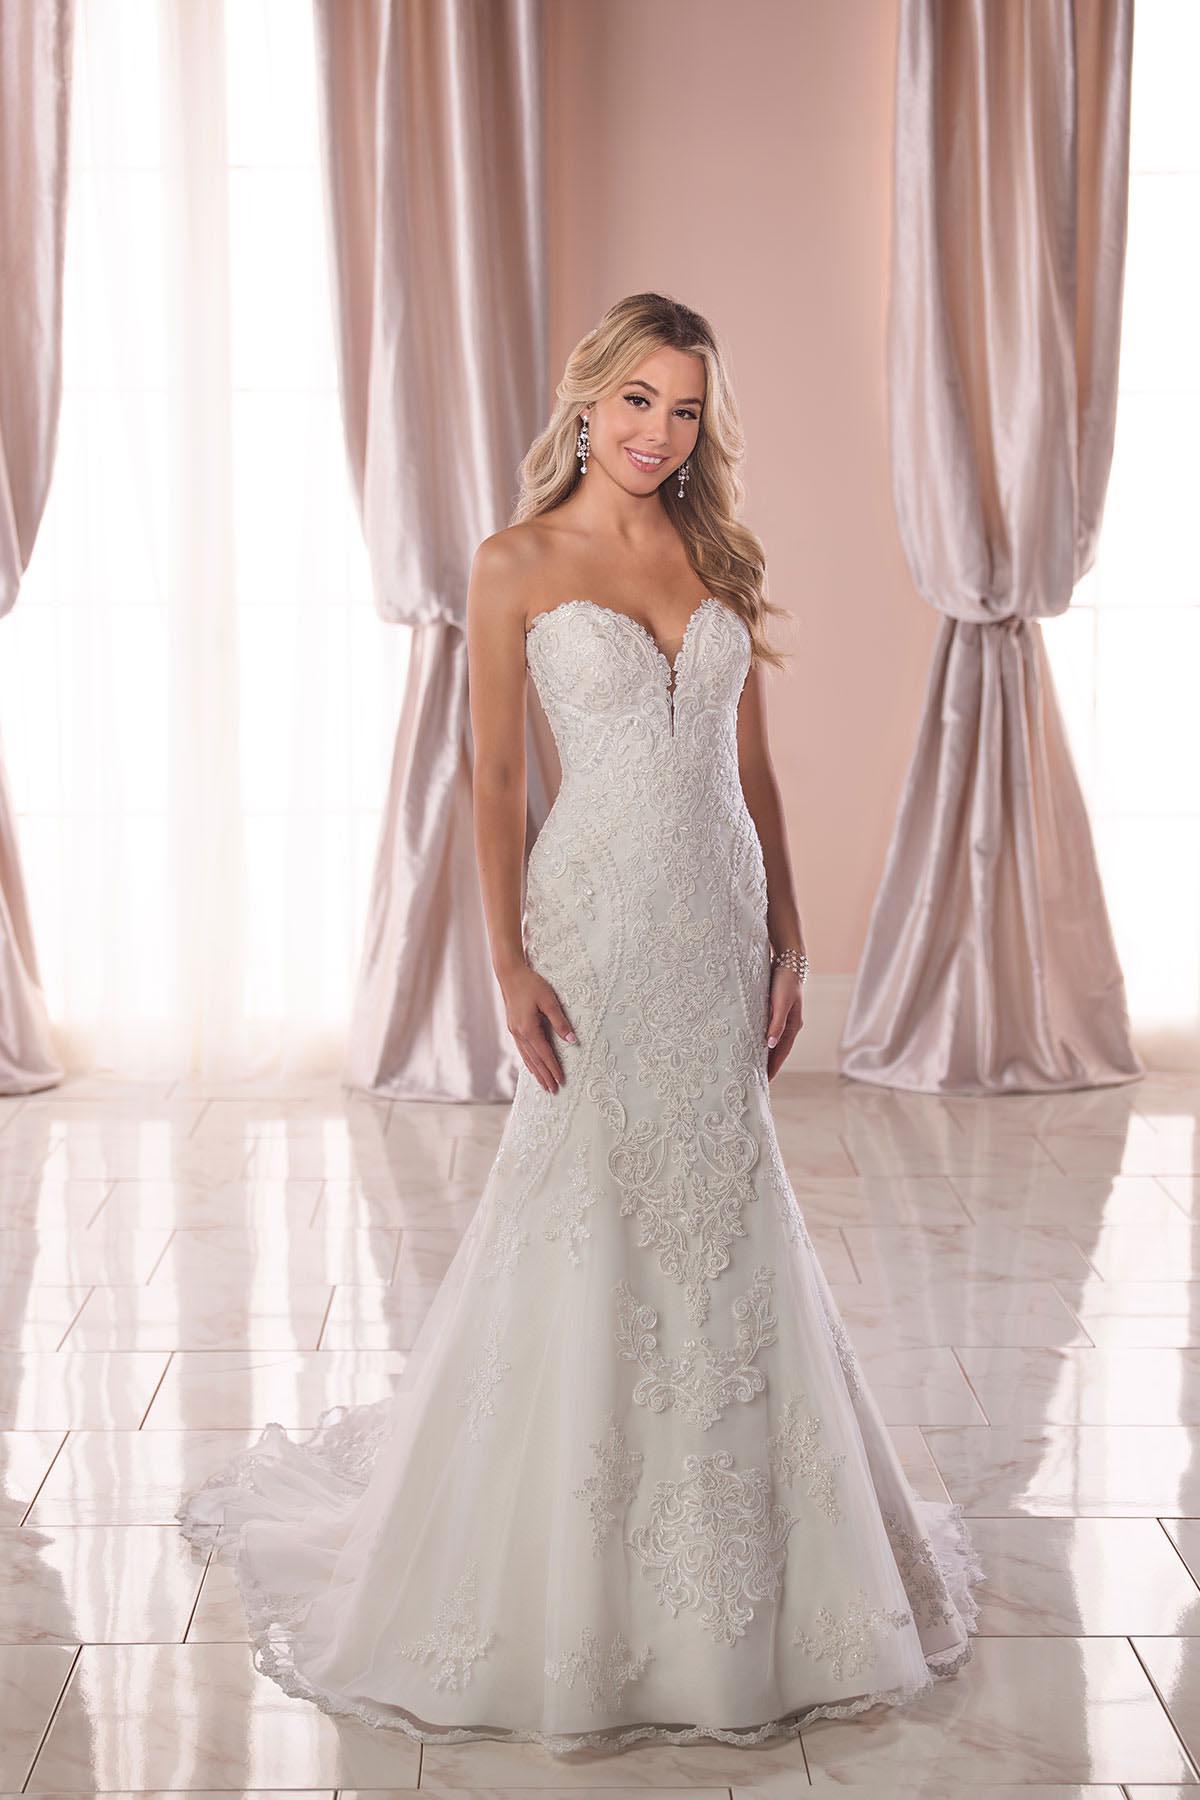 Bliss Bridal Salon Bridal Gowns Wedding Dresses Fort Worth